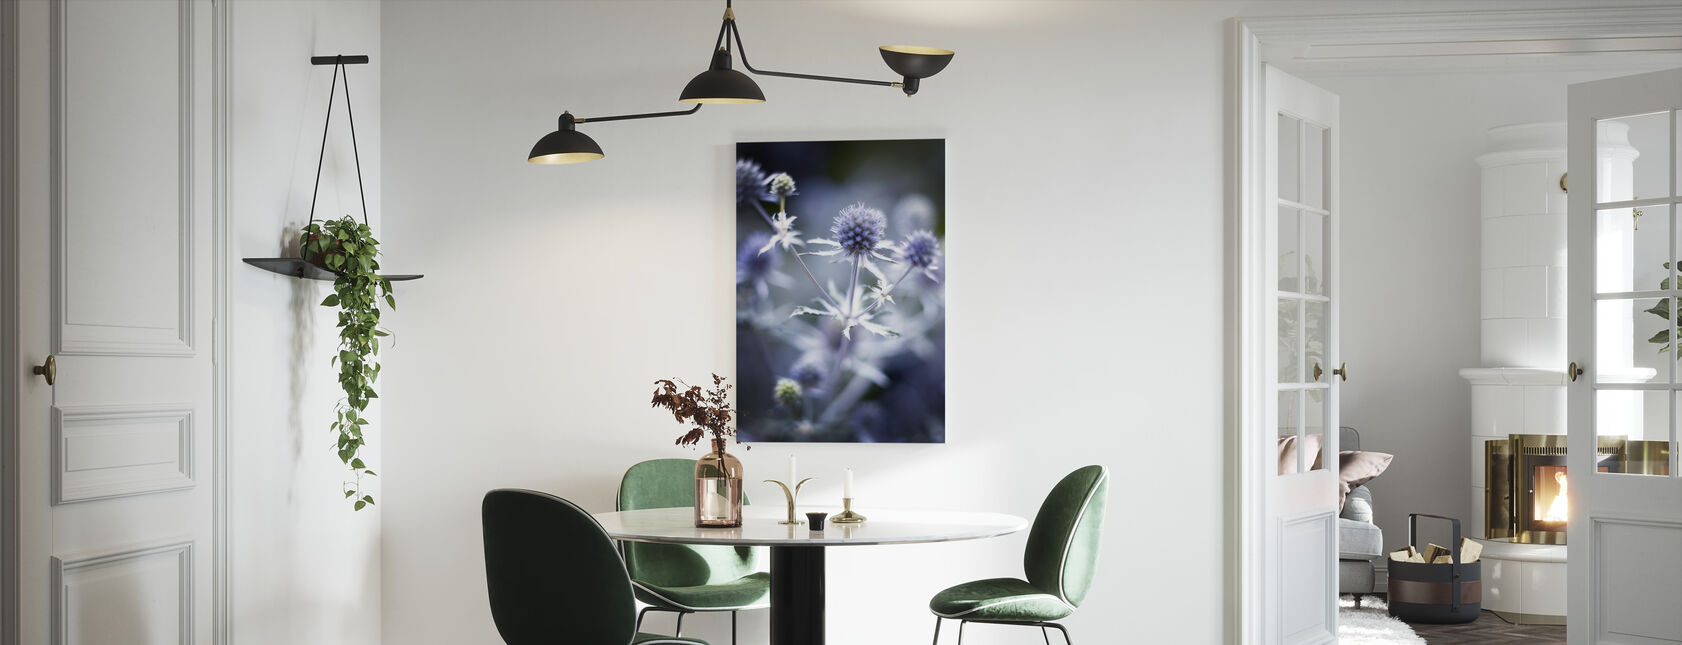 Eryngium Planum Thistle - Canvas print - Kitchen